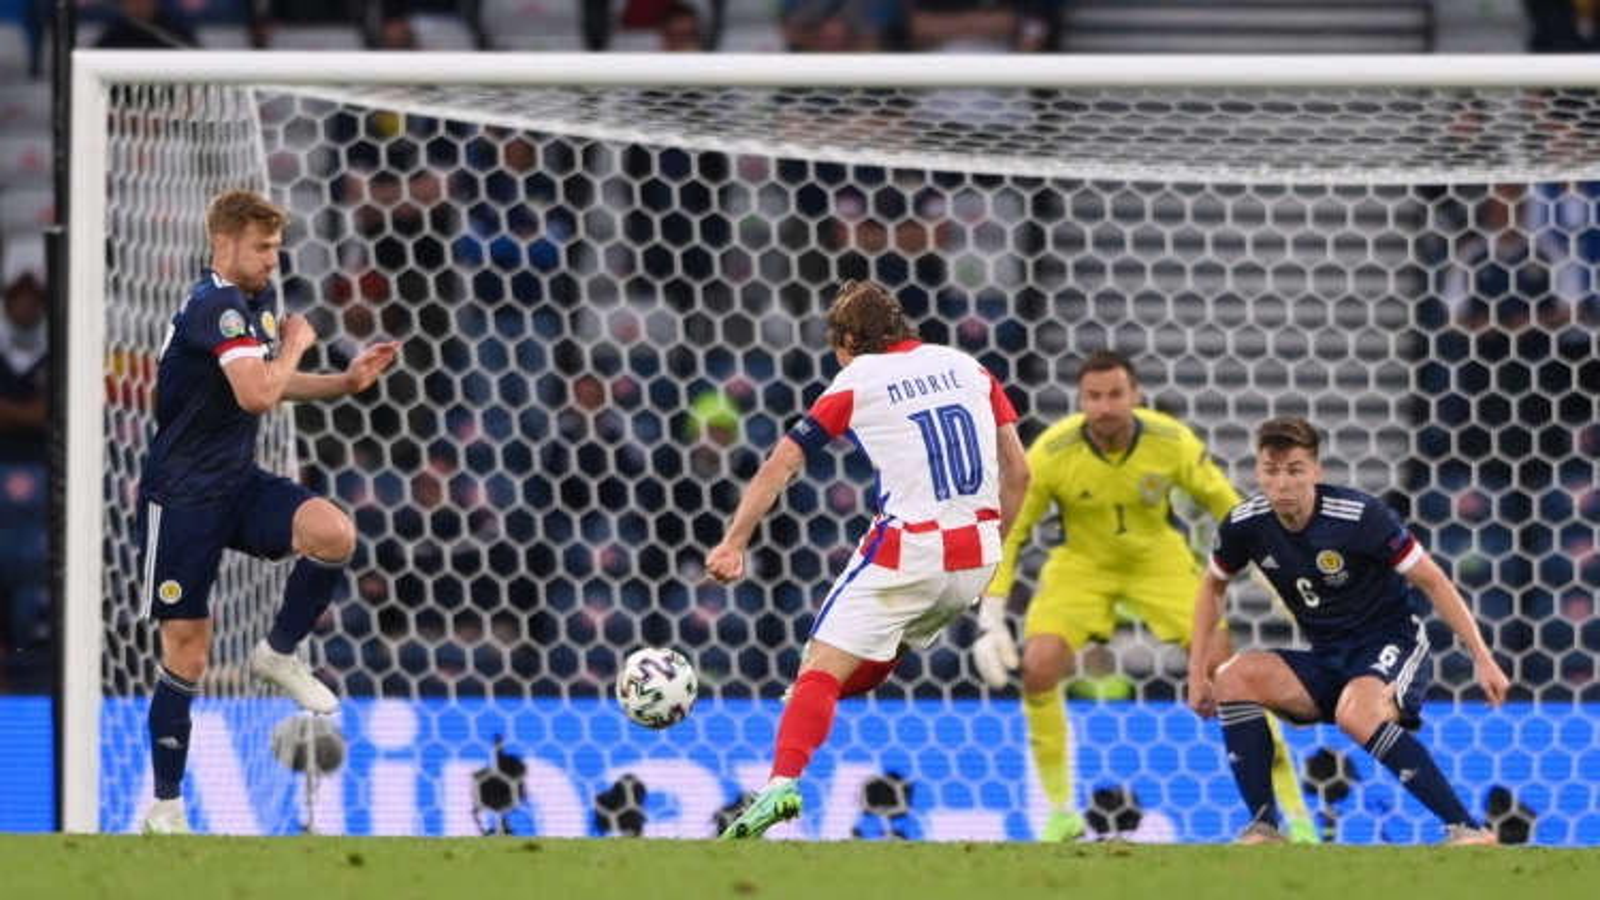 Trực tiếp Croatia 3-1 Scotland: Tuyệt phẩm của Modric